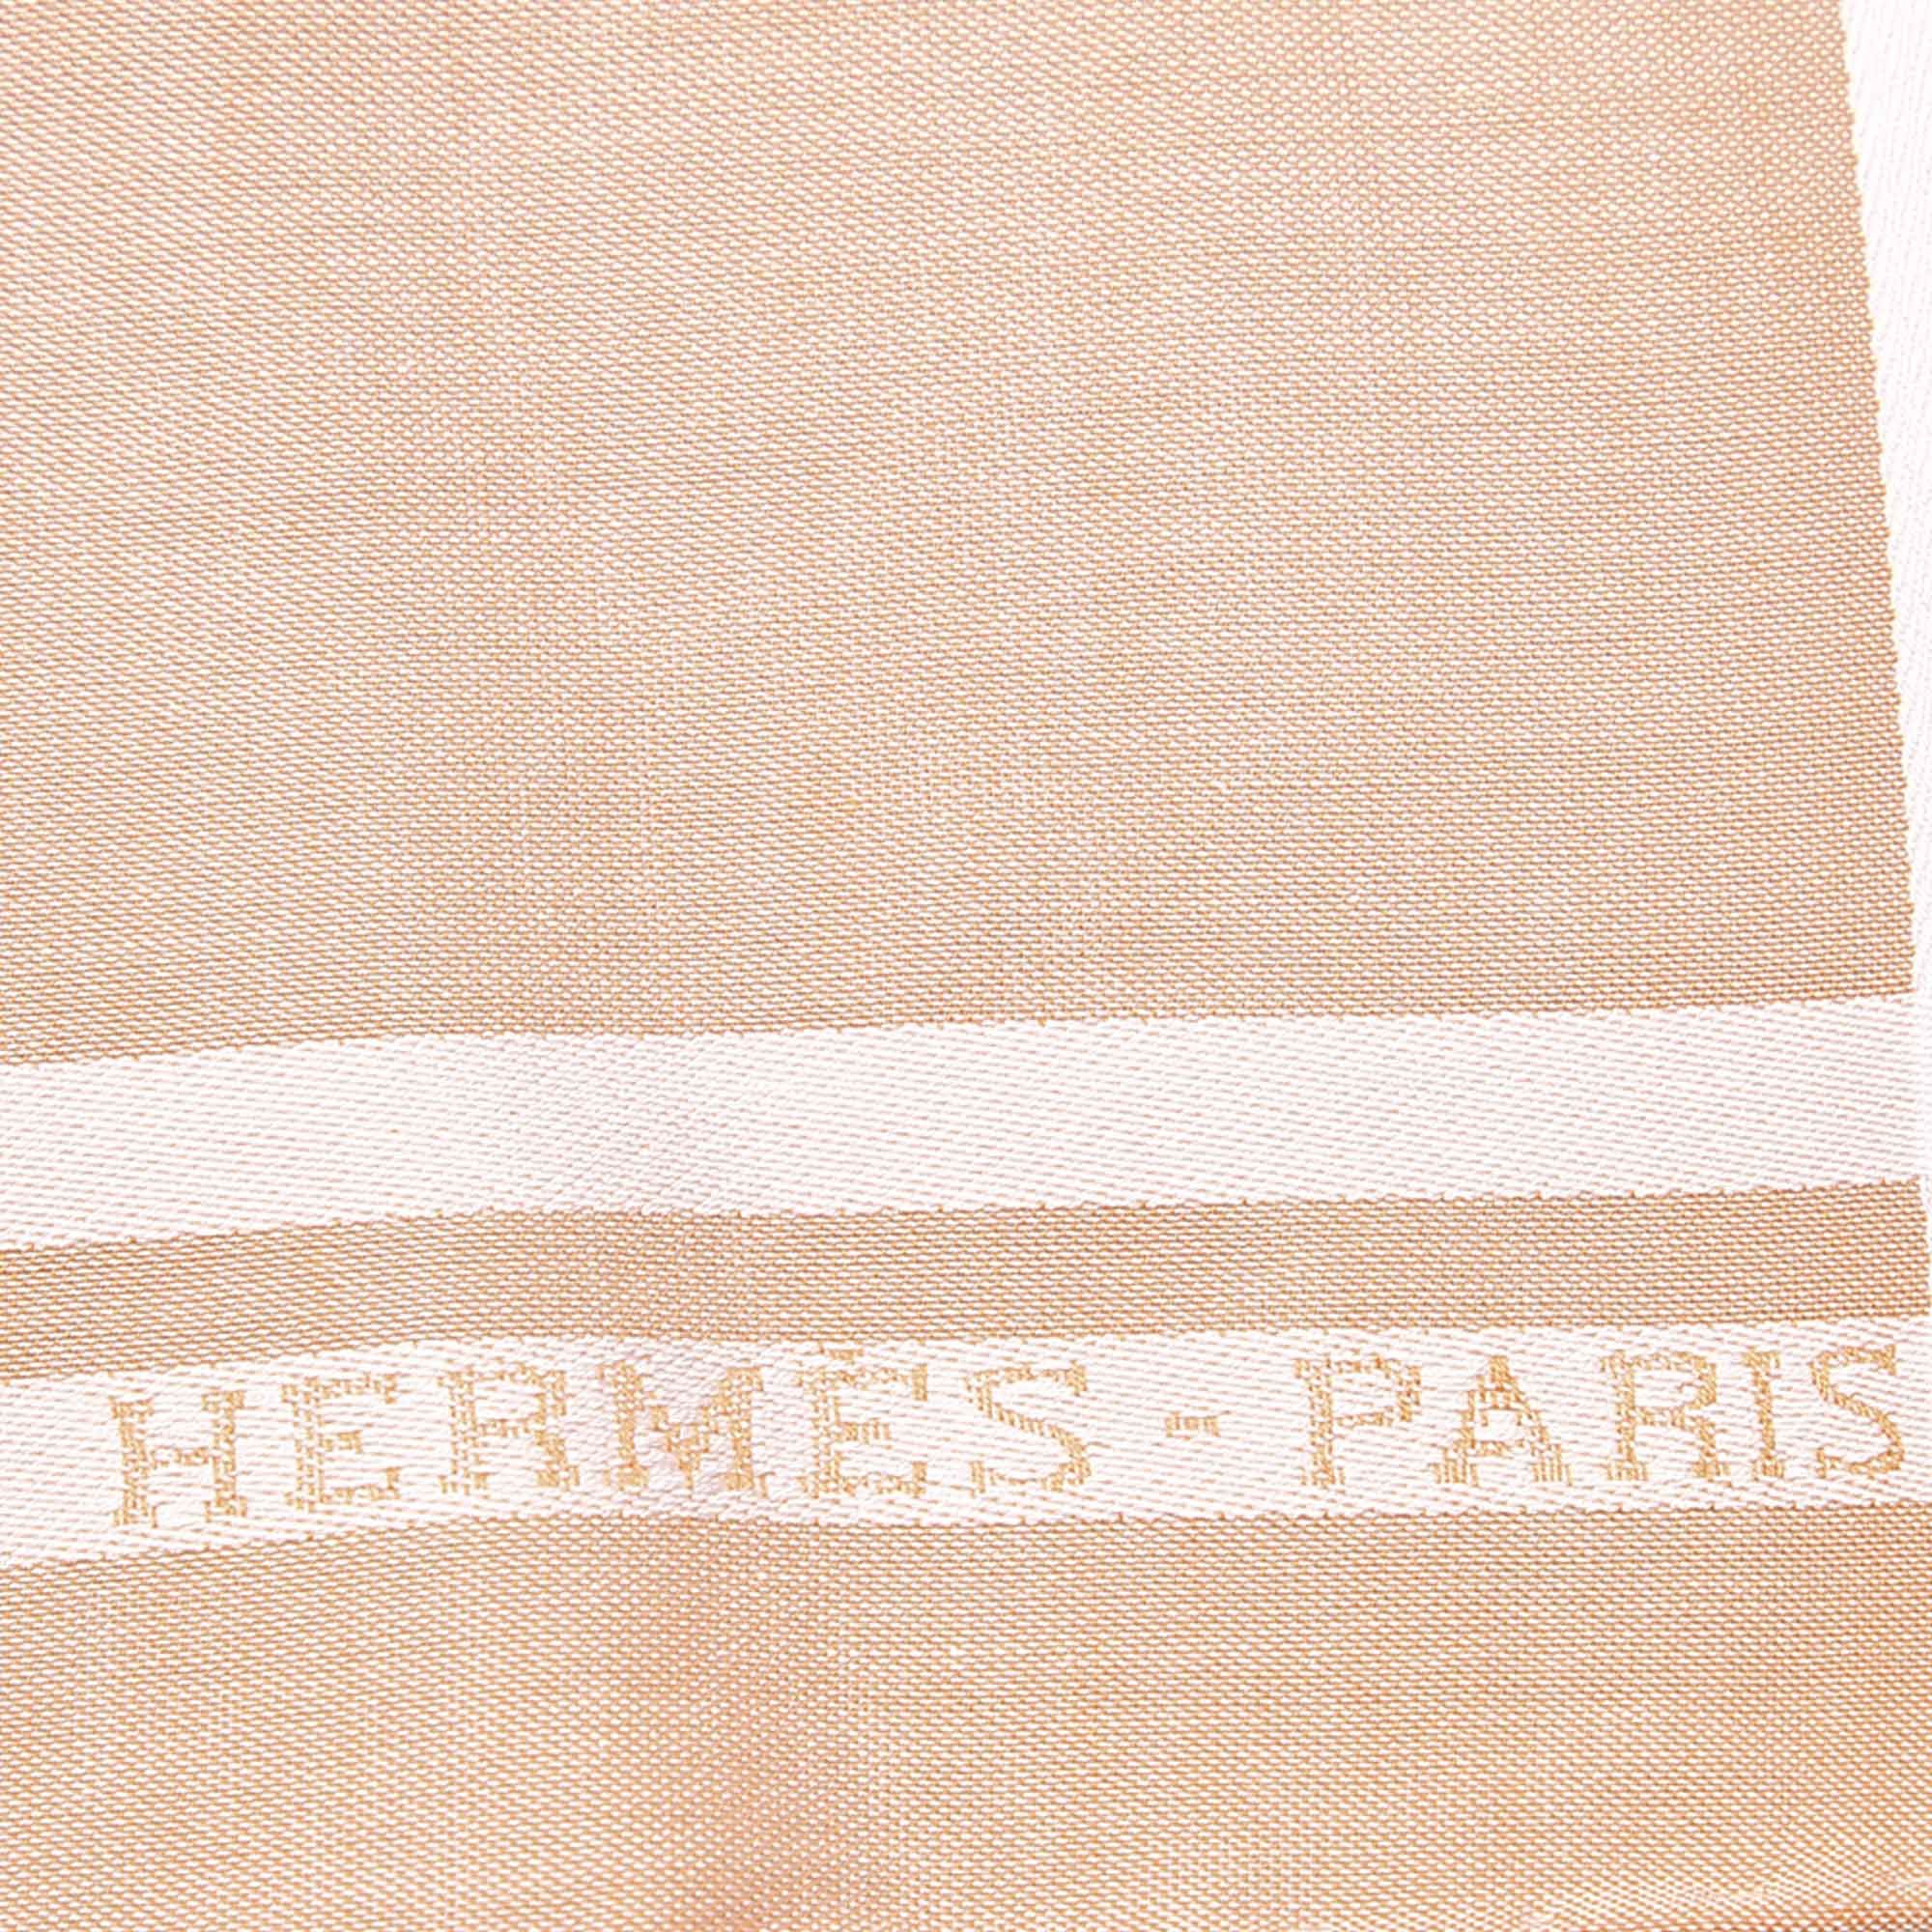 Vintage Hermes Cotton Handkerchief Pink